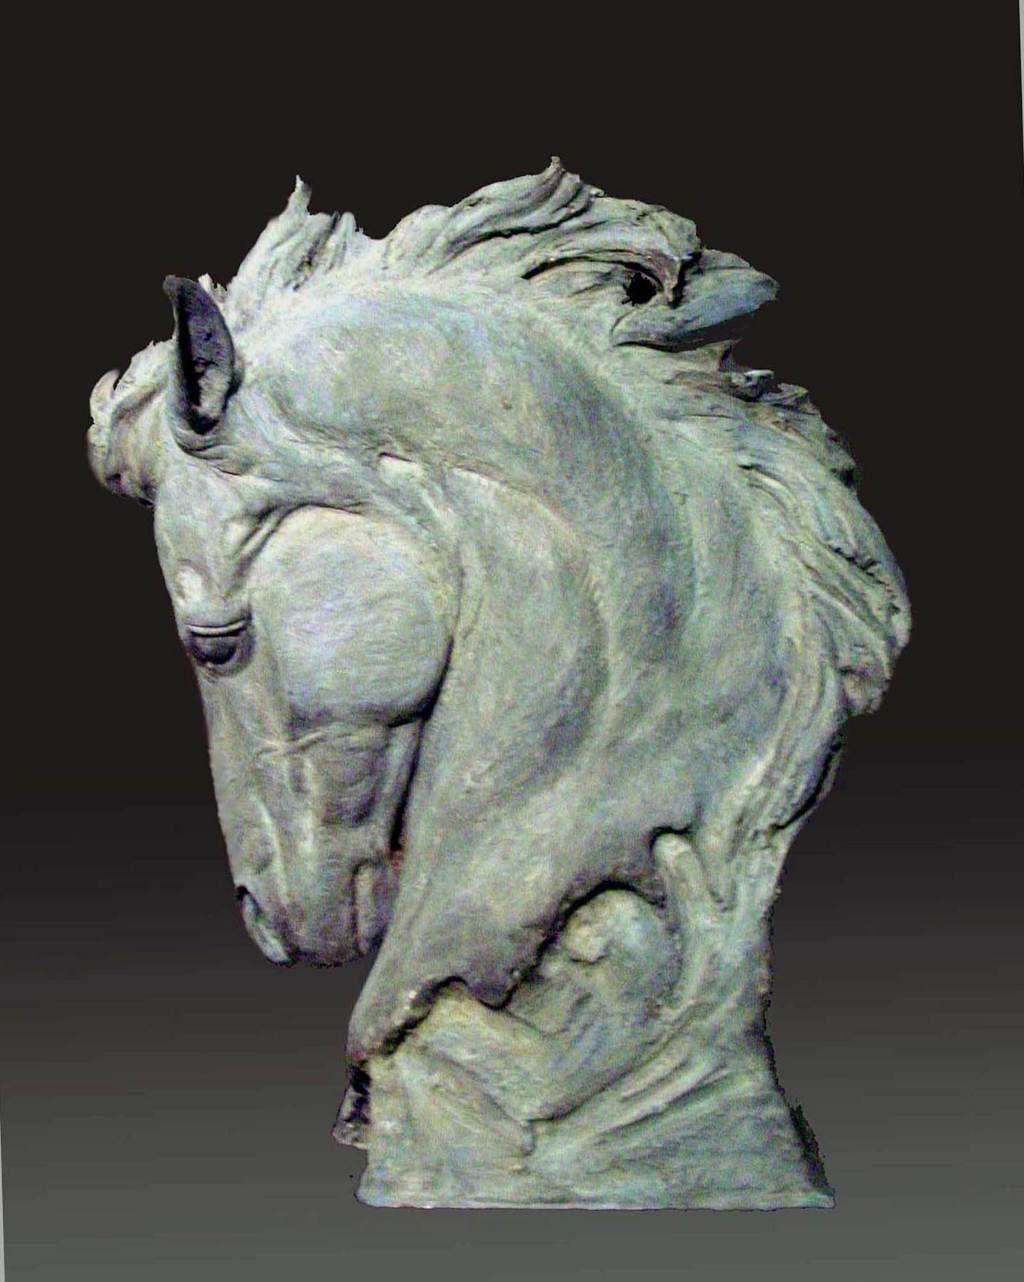 ceramic horse sculptures Google Search Horse sculpture